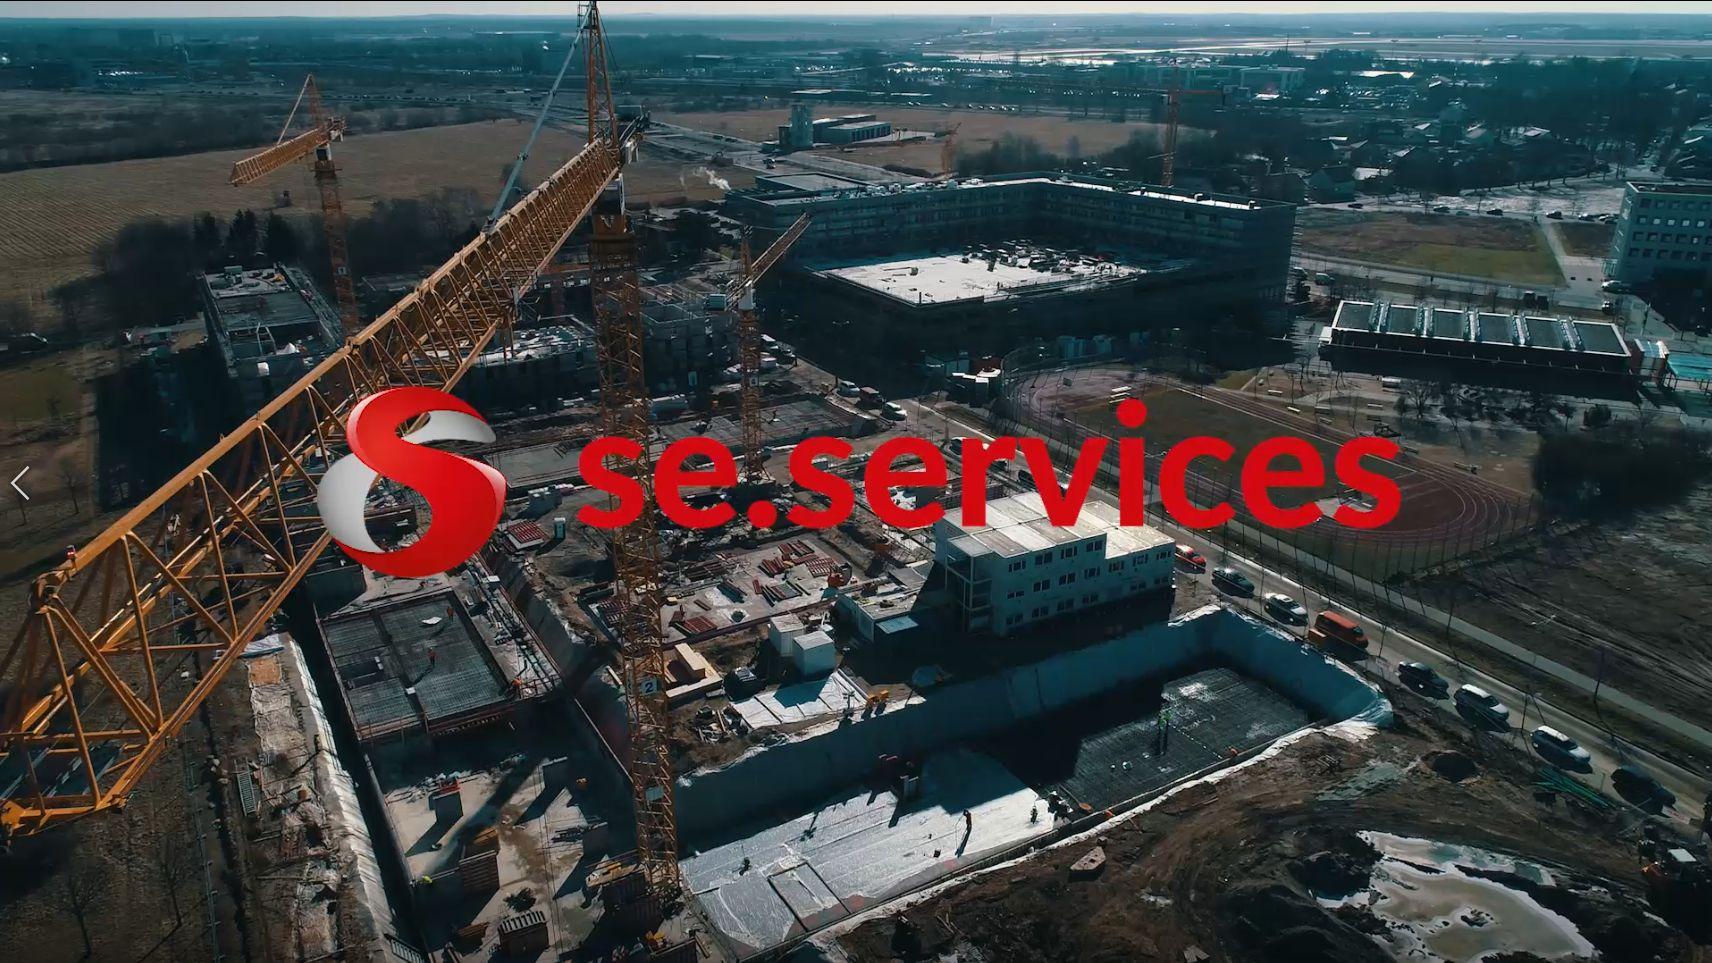 se.services_Imagefilm_Titles_HD_Thumbnail